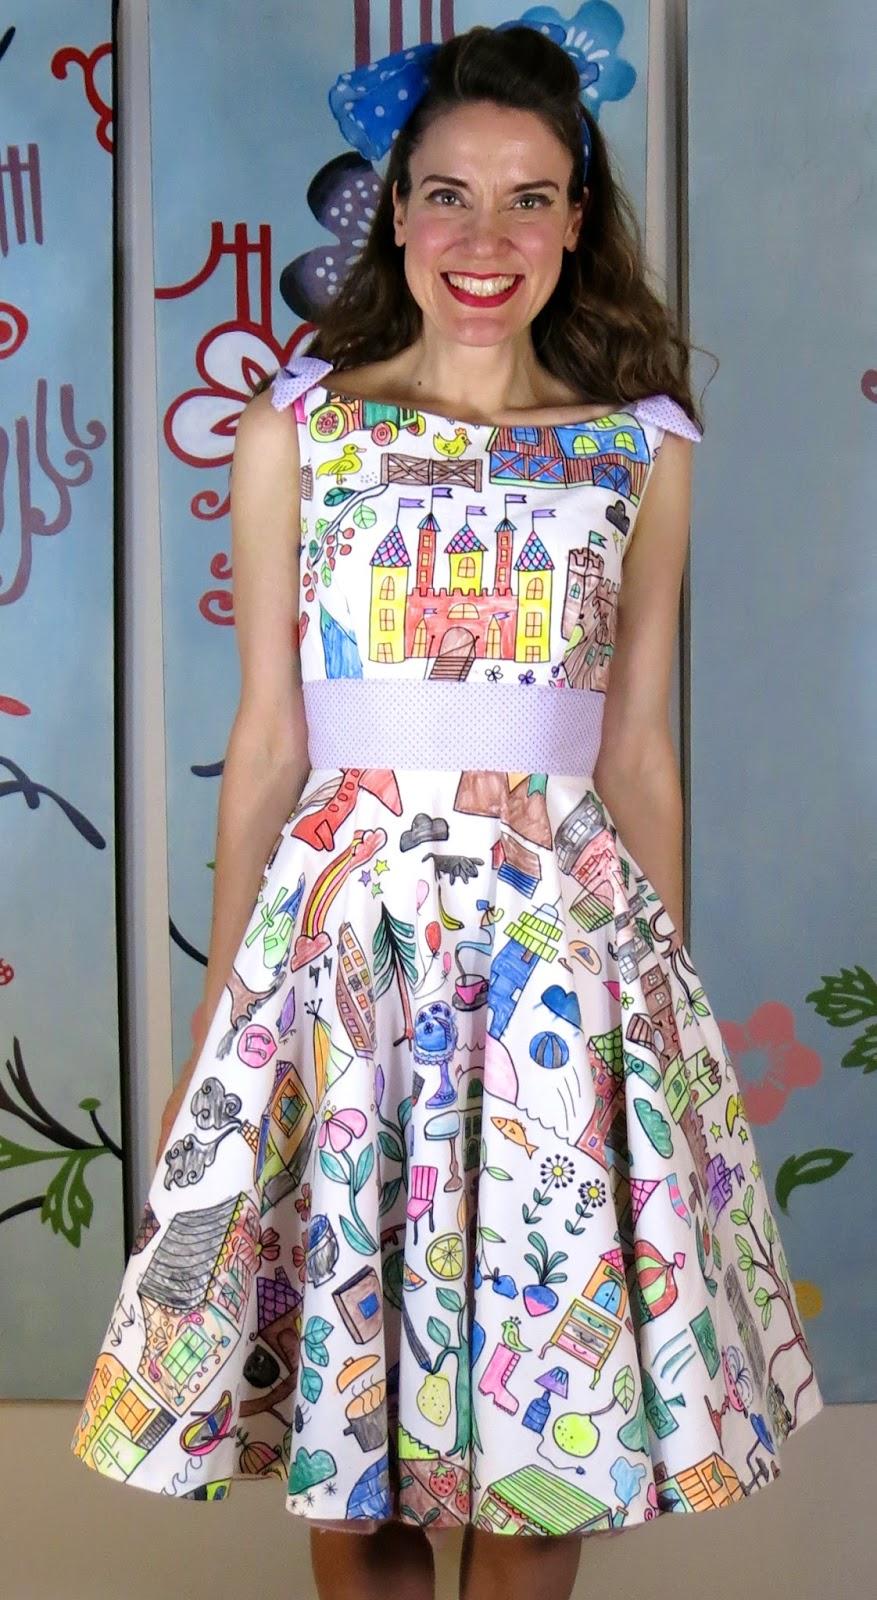 DIY A Coloring Book Dress